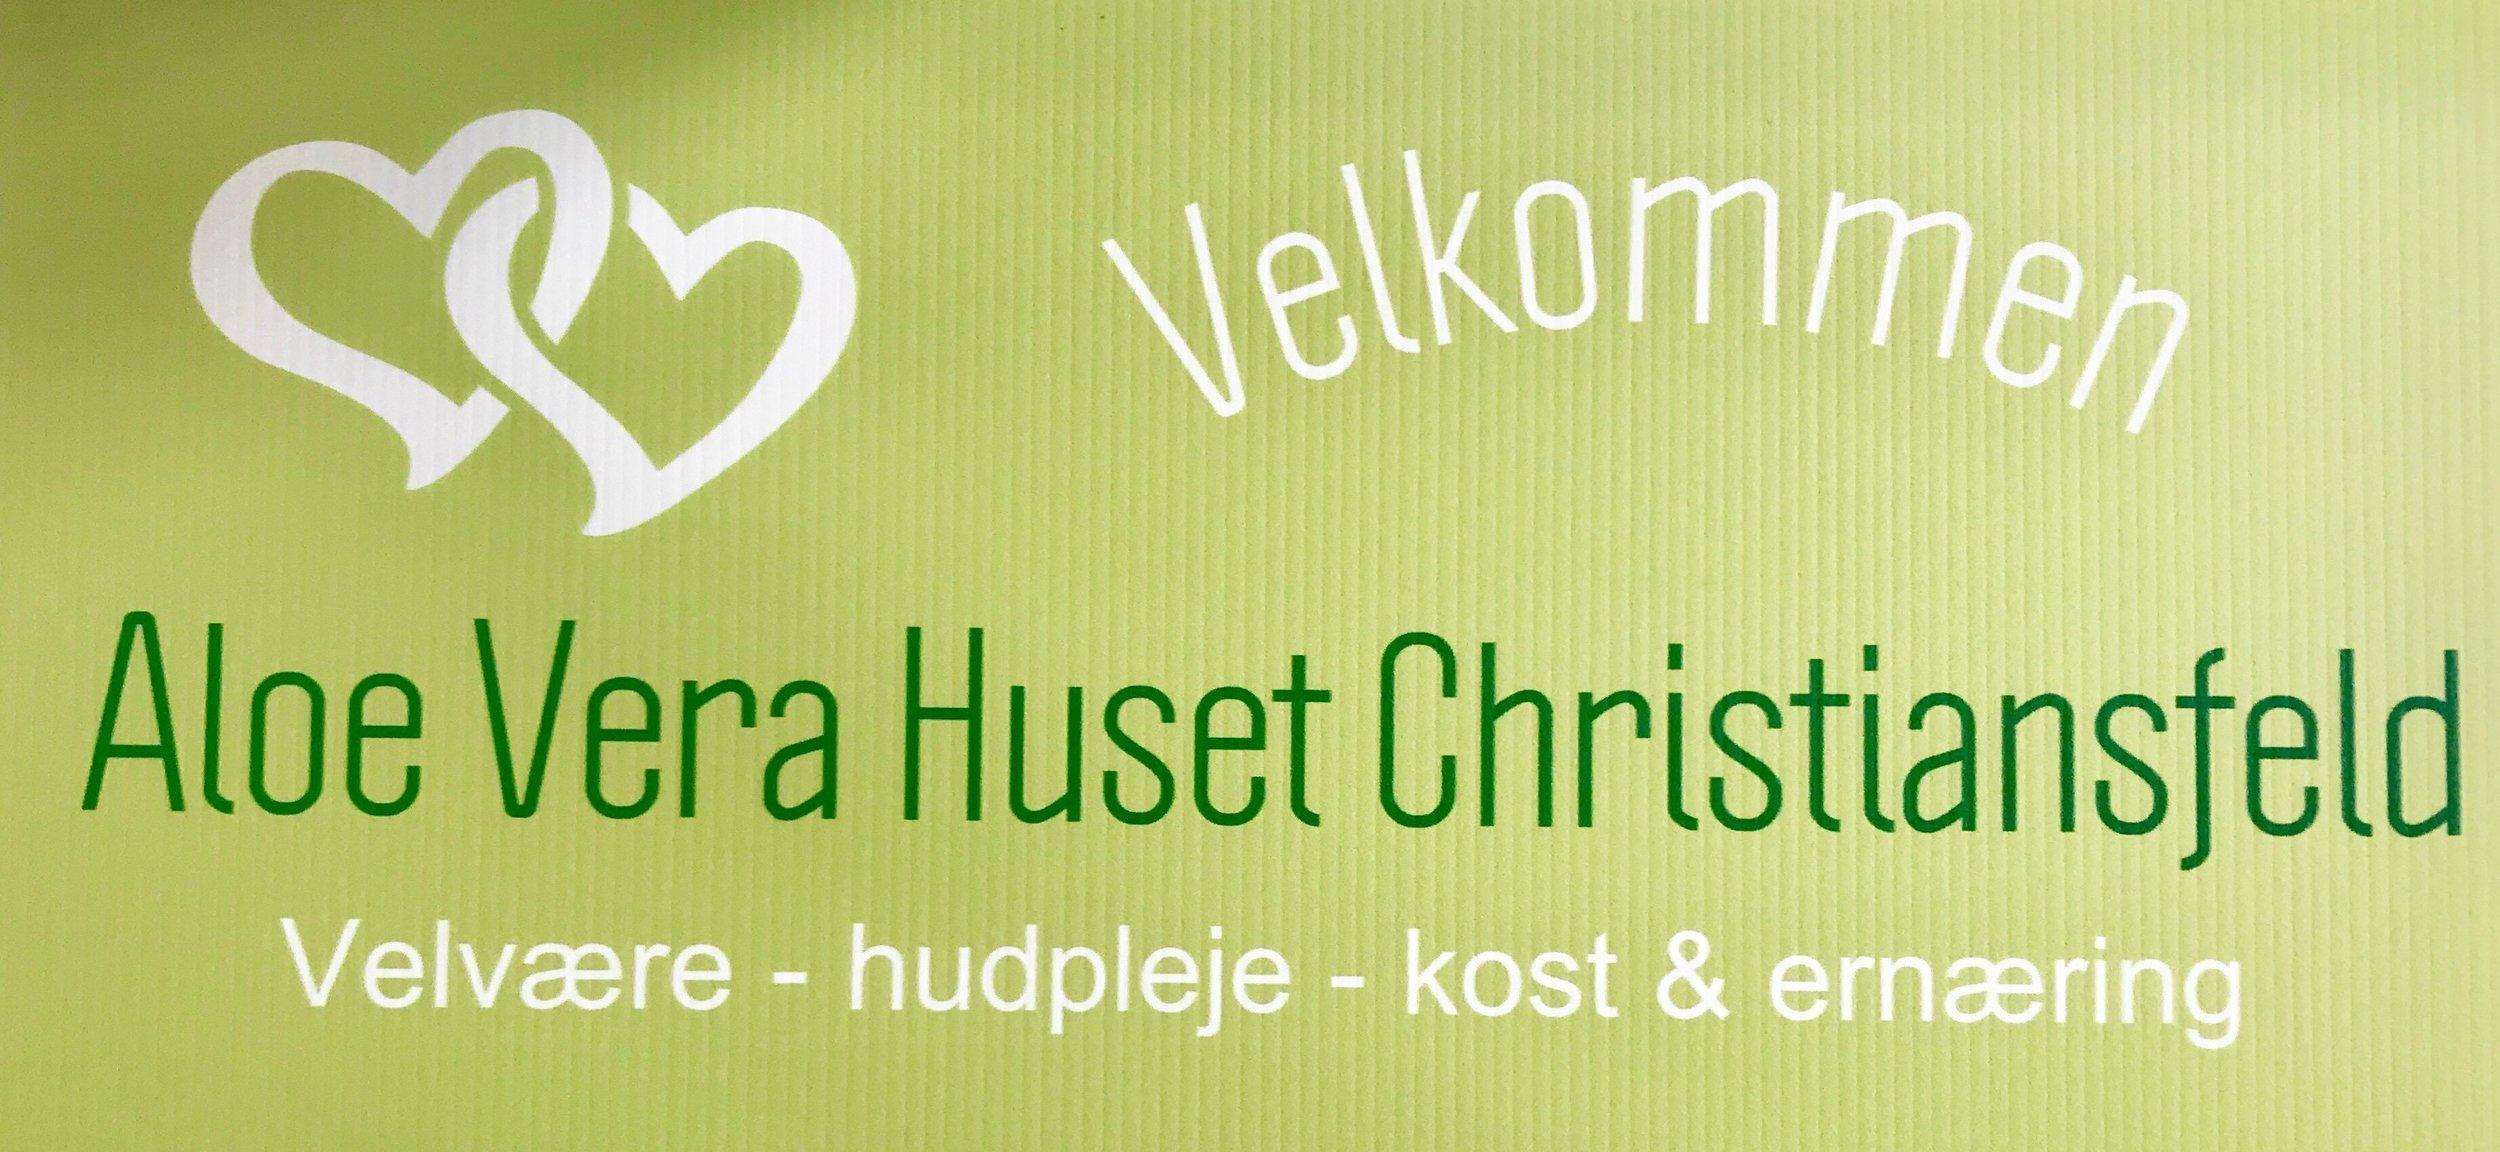 Aloe Vera Huset Christiansfeld -